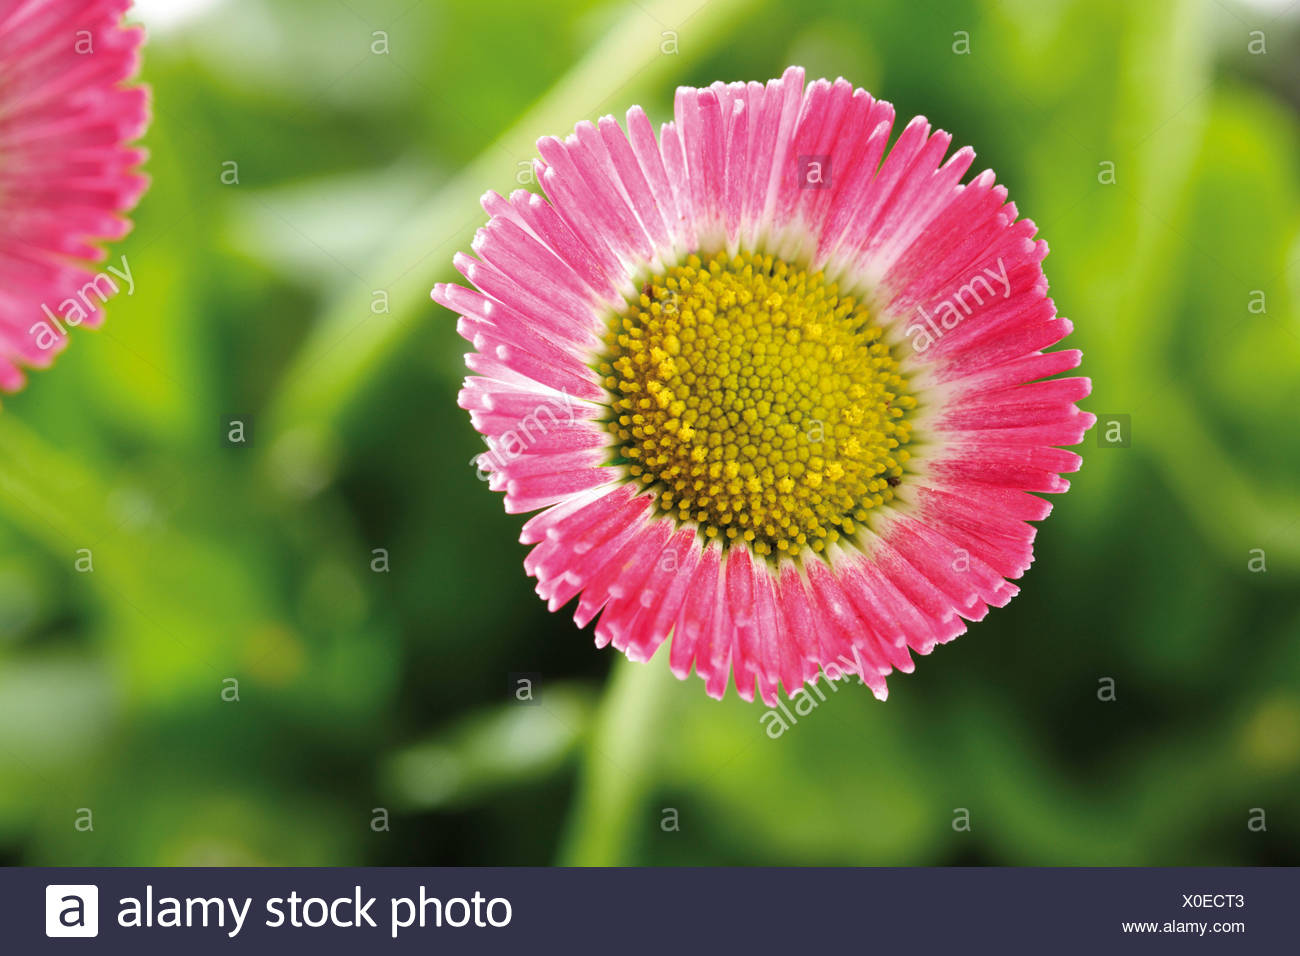 Pink english daisy flower asteraceae stock photos pink english common daisies bellis perennis stock image izmirmasajfo